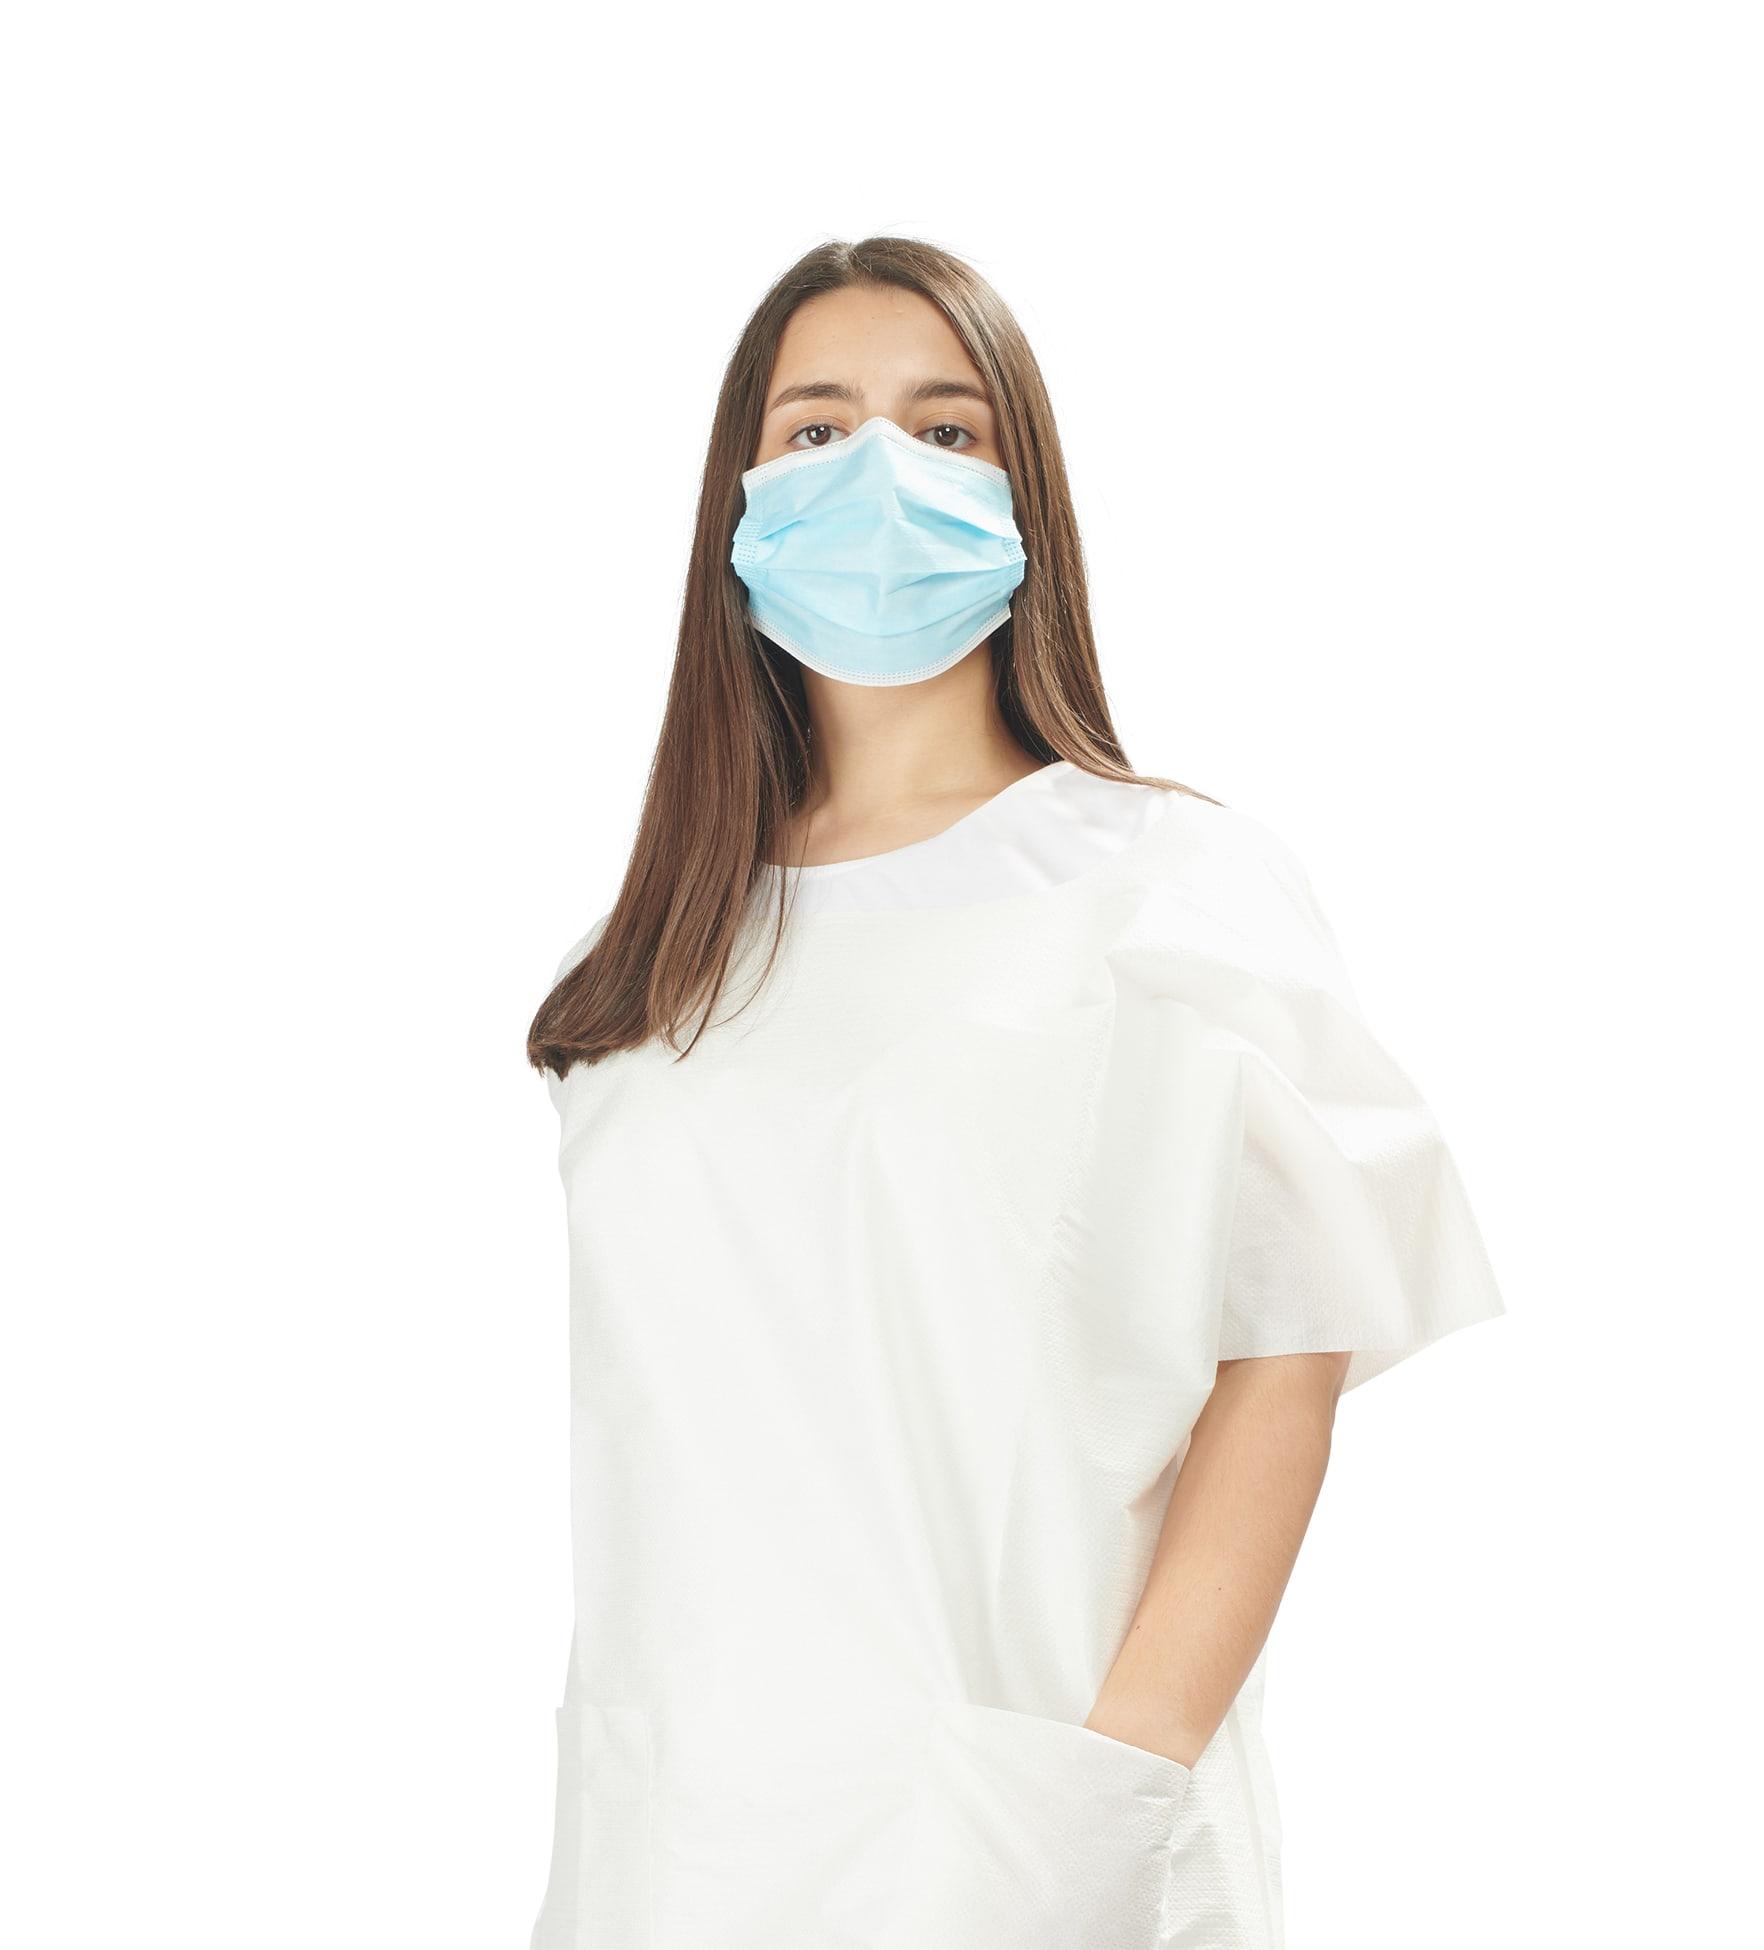 fardas de bloco hidrófuga 2 - water repellent scrubs - clothe protect